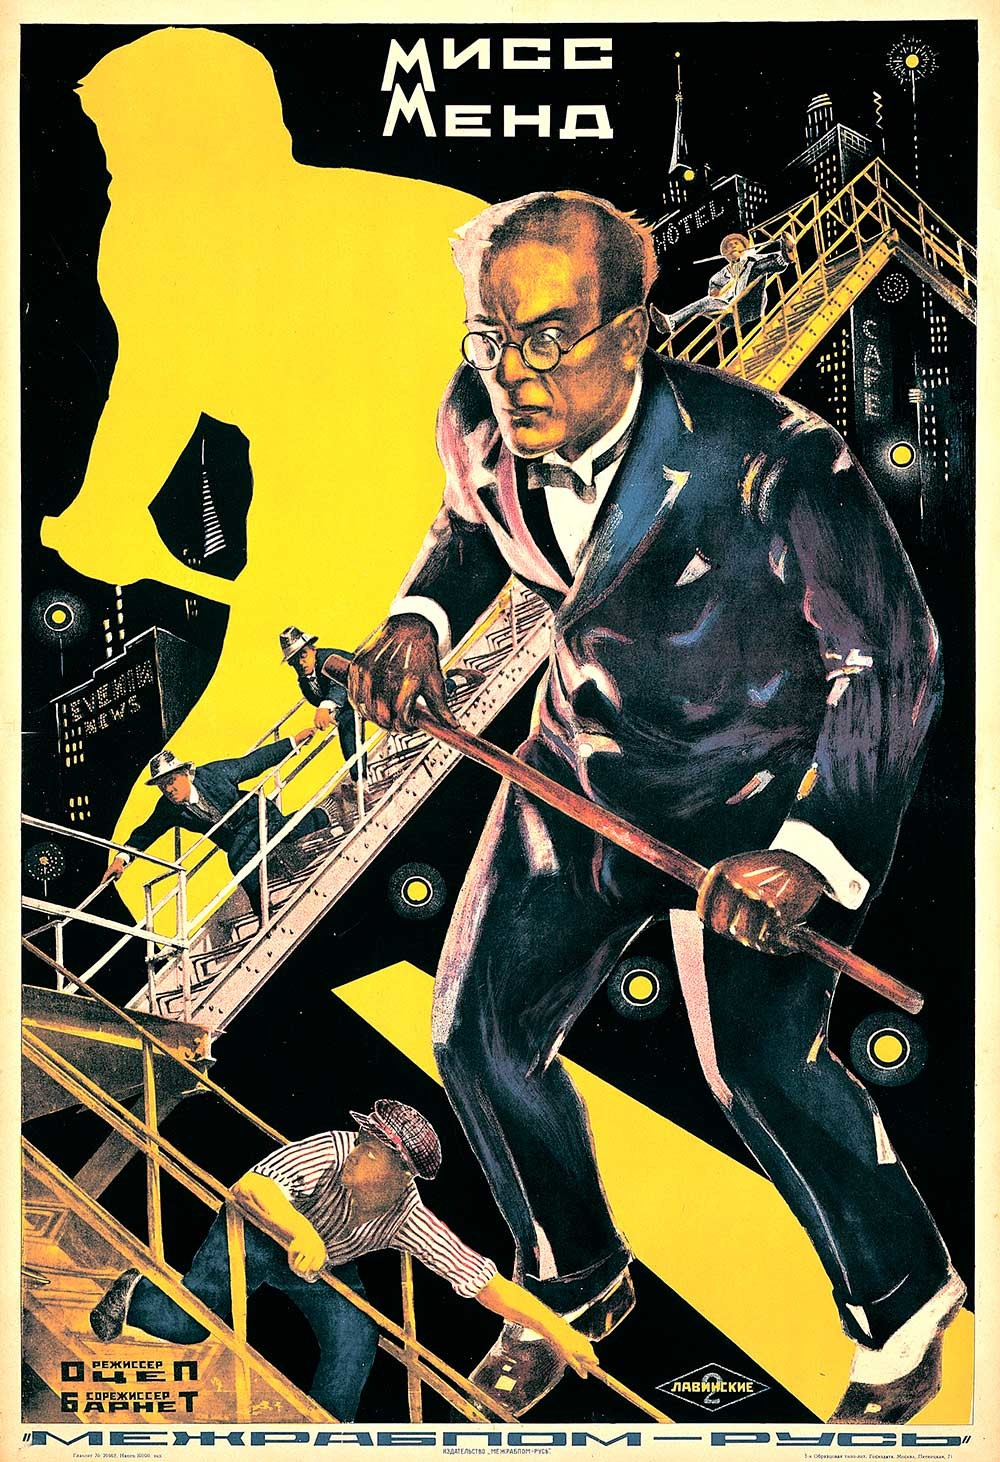 Bildunterschrift: Anton Lavinsky, Film poster for Miss Mend, 1927